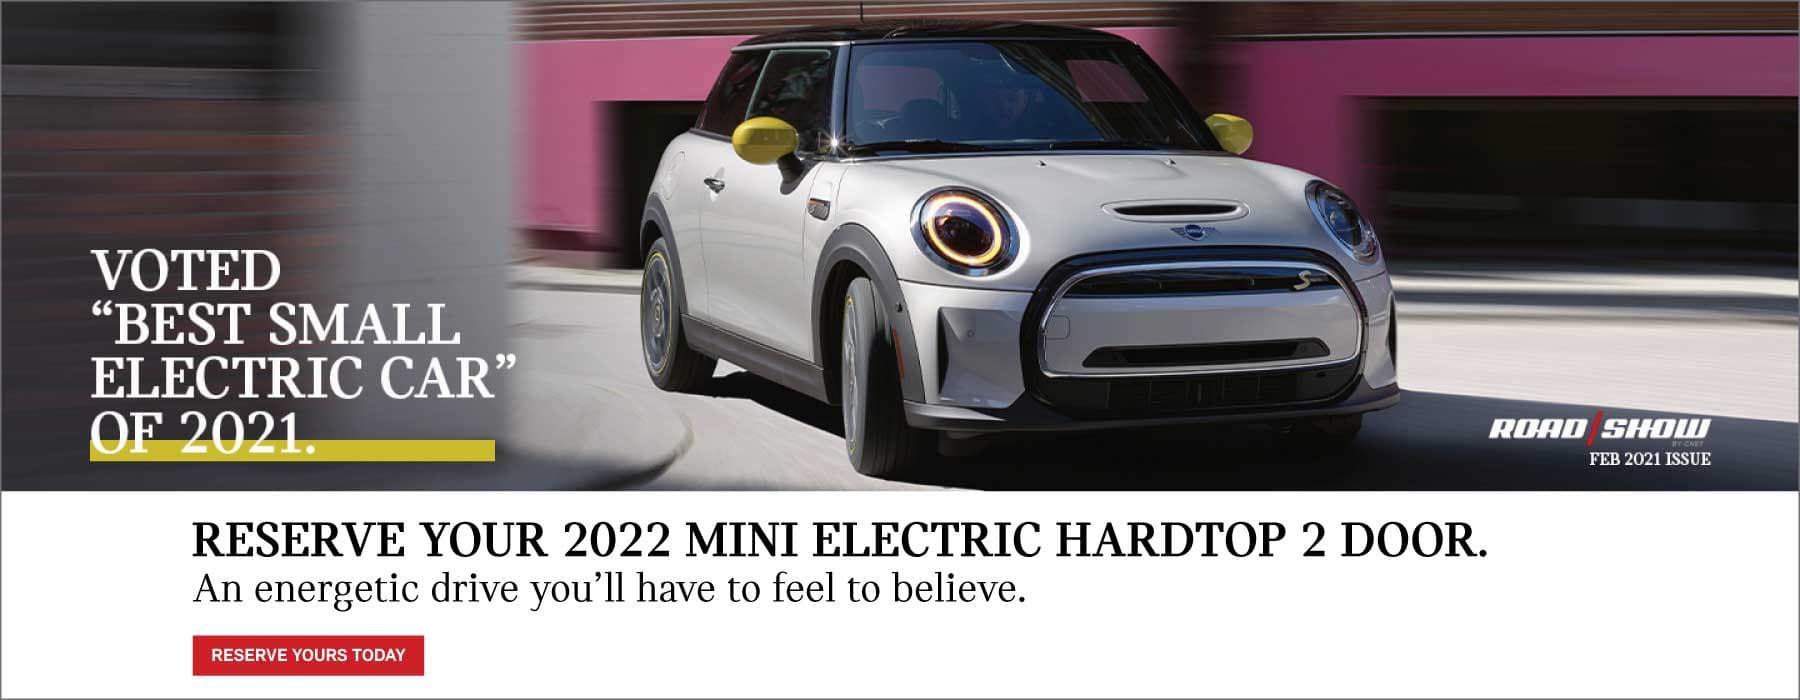 Reserve your MINI Electric Hardtop 2 door. Reserve your today!